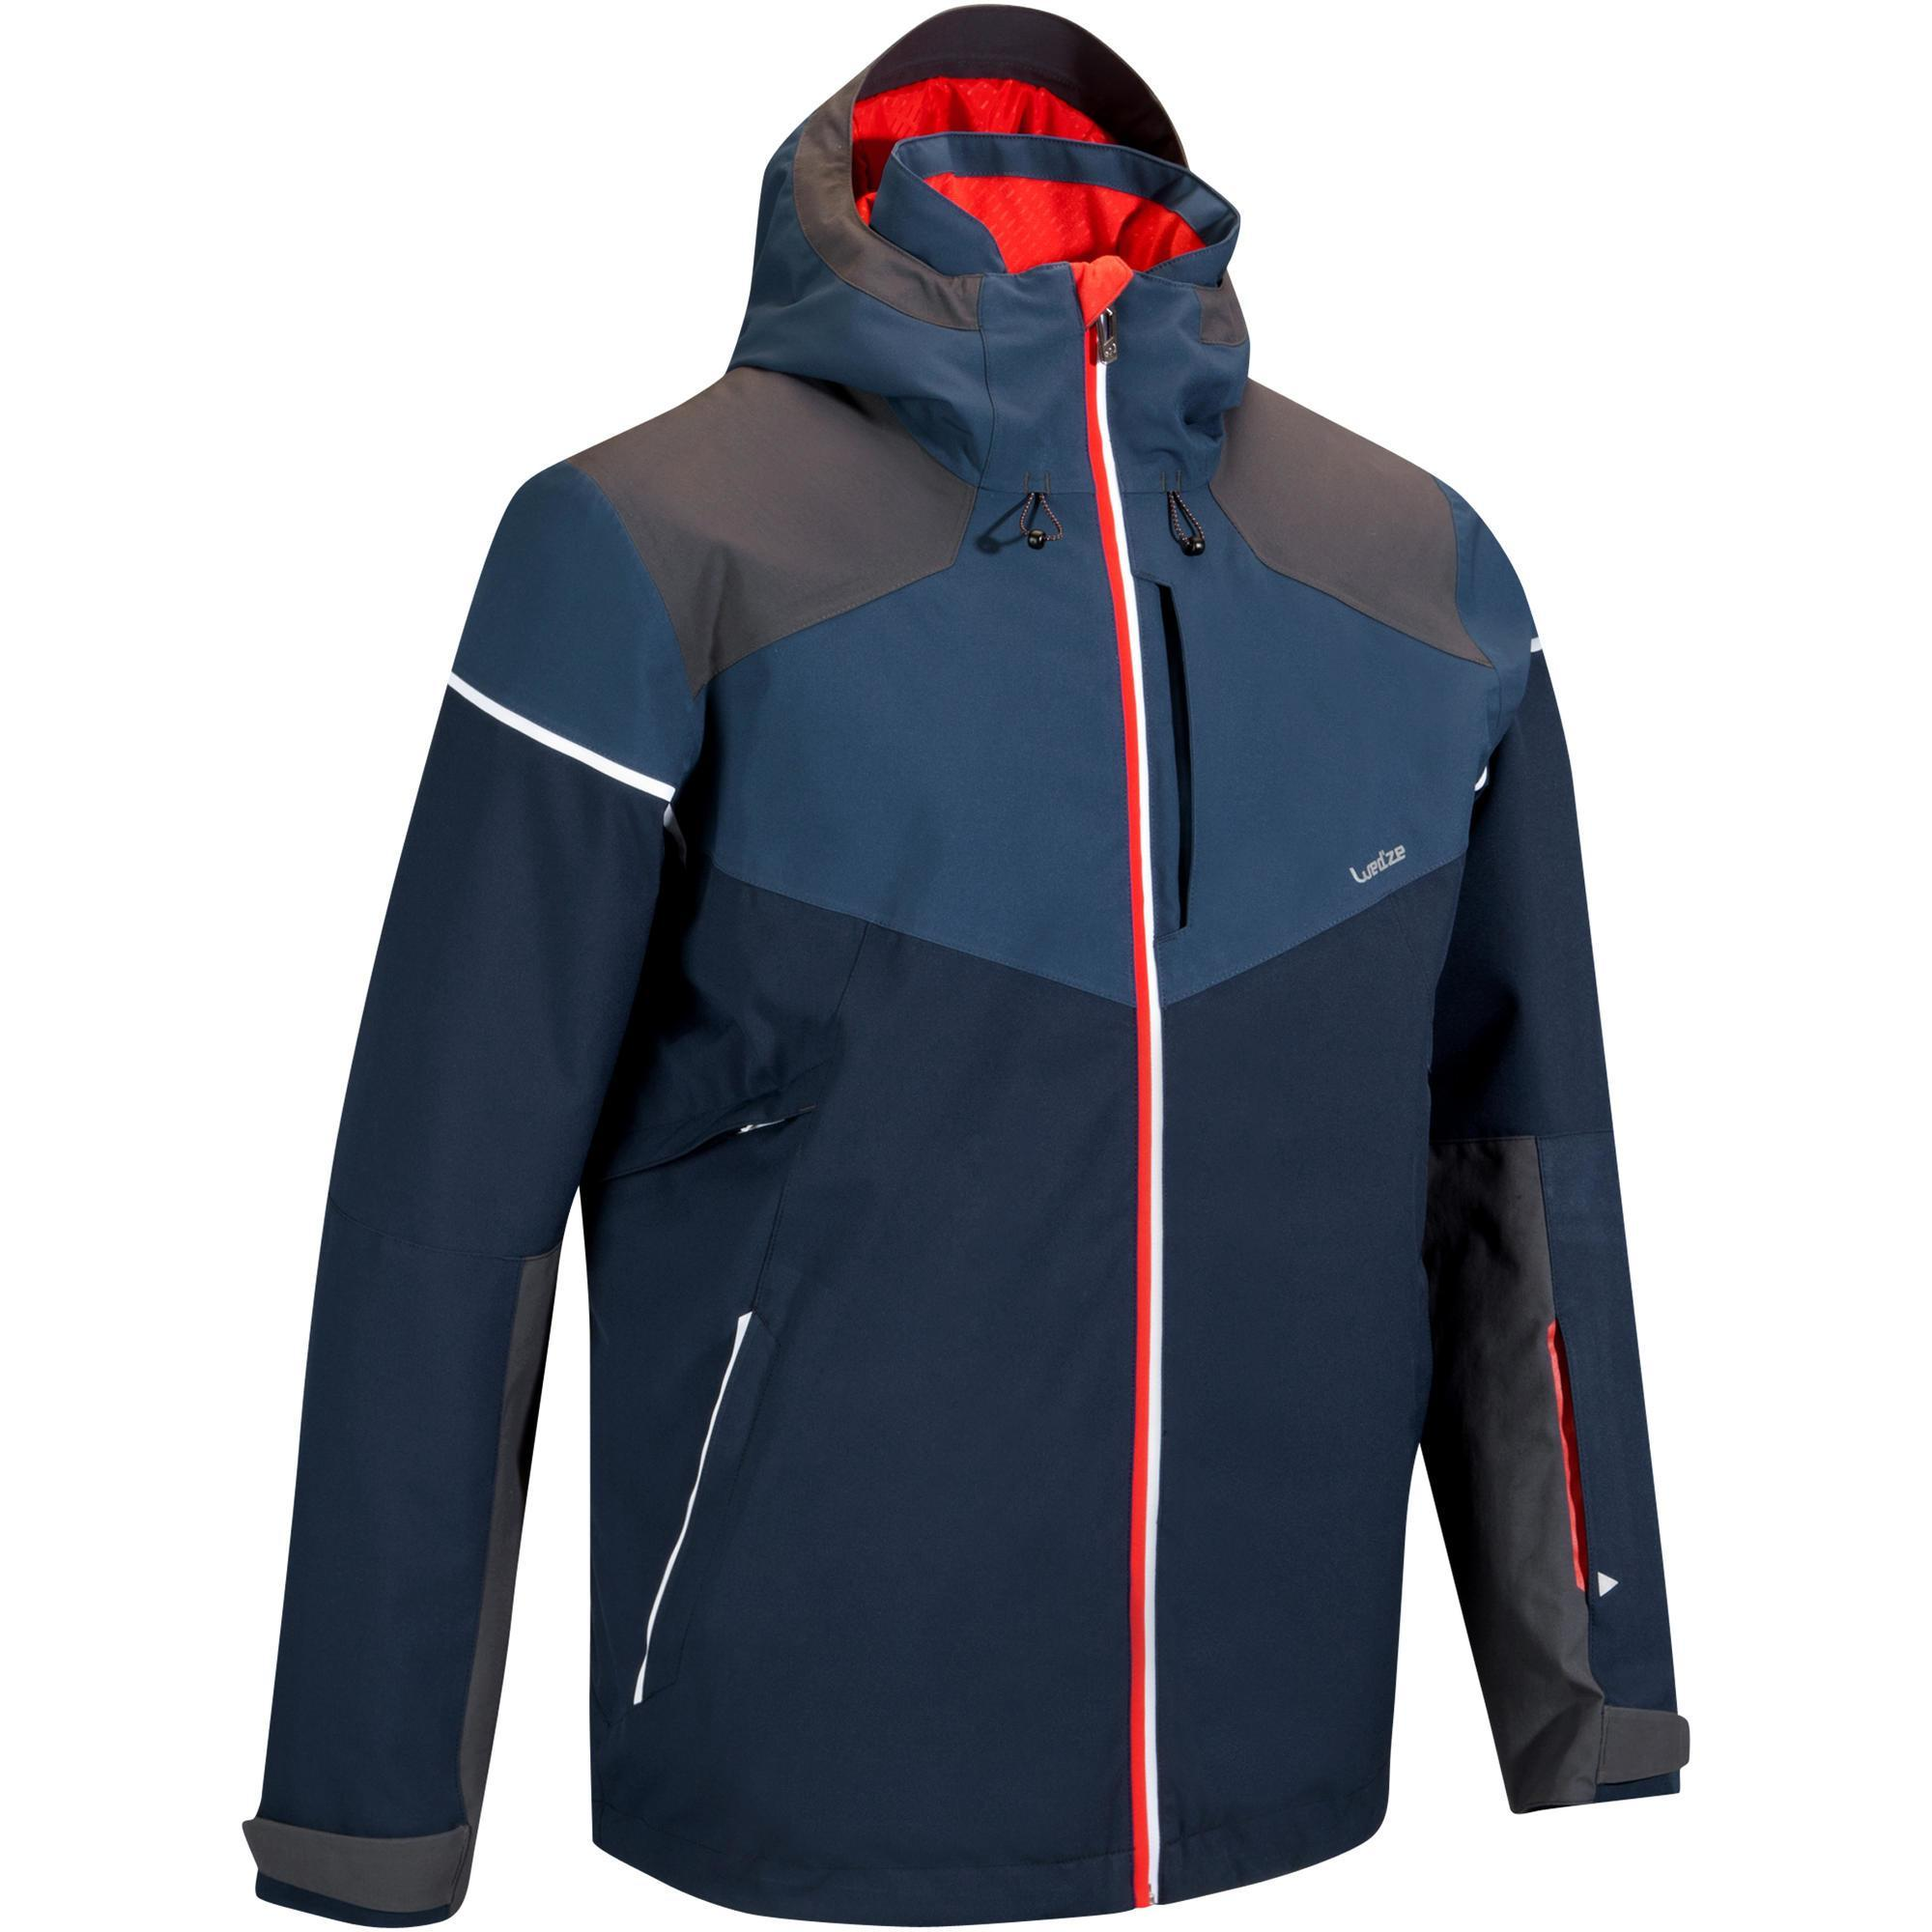 Comprar Chaqueta de Esquí Wed ze 580 Hombre Azul Marino  8f43e595d4b8